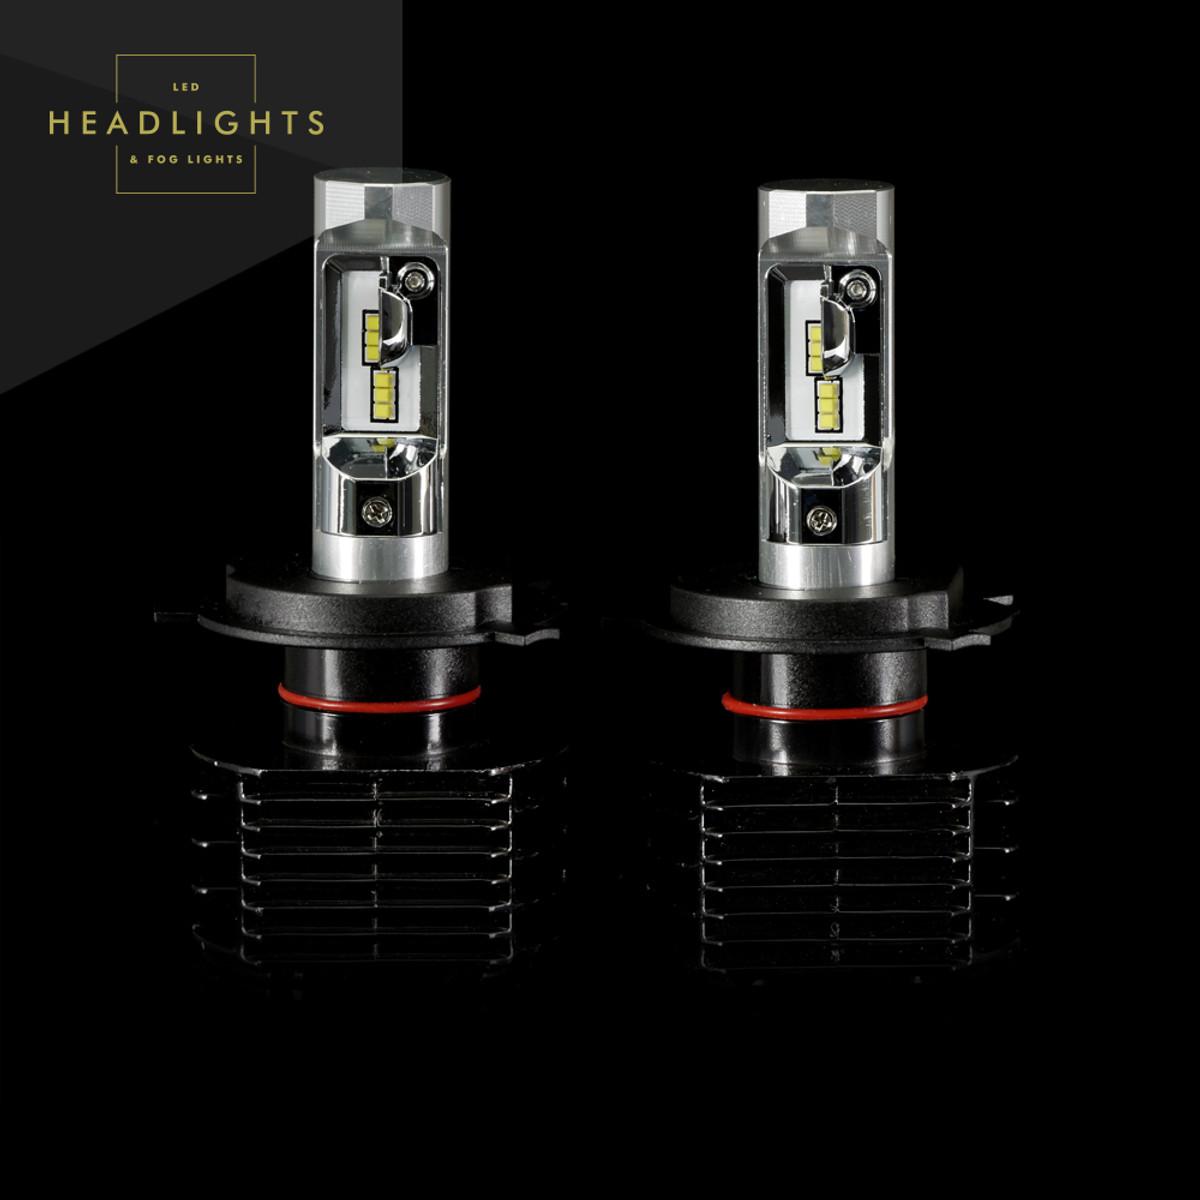 Gtr Lighting Ultra Series Led Headlight Bulbs H4 9003 3rd Oem Relay Wiring Harness System 4 Headl Light Bulb Generation